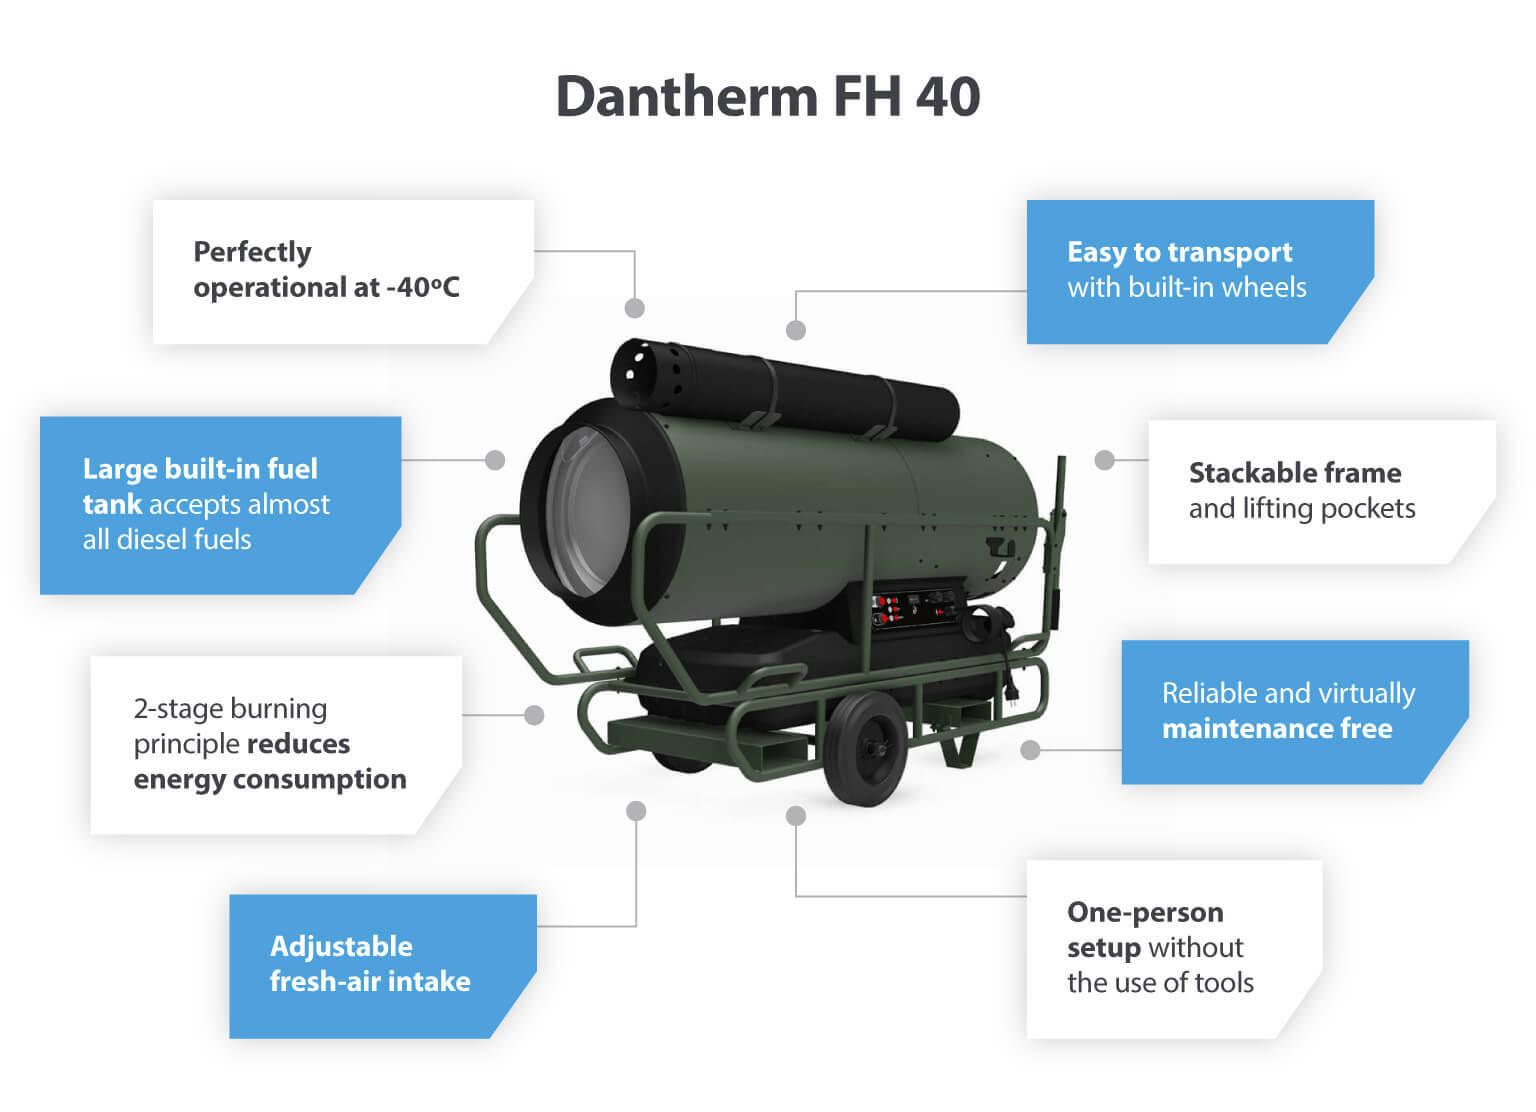 Dantherm FH 40